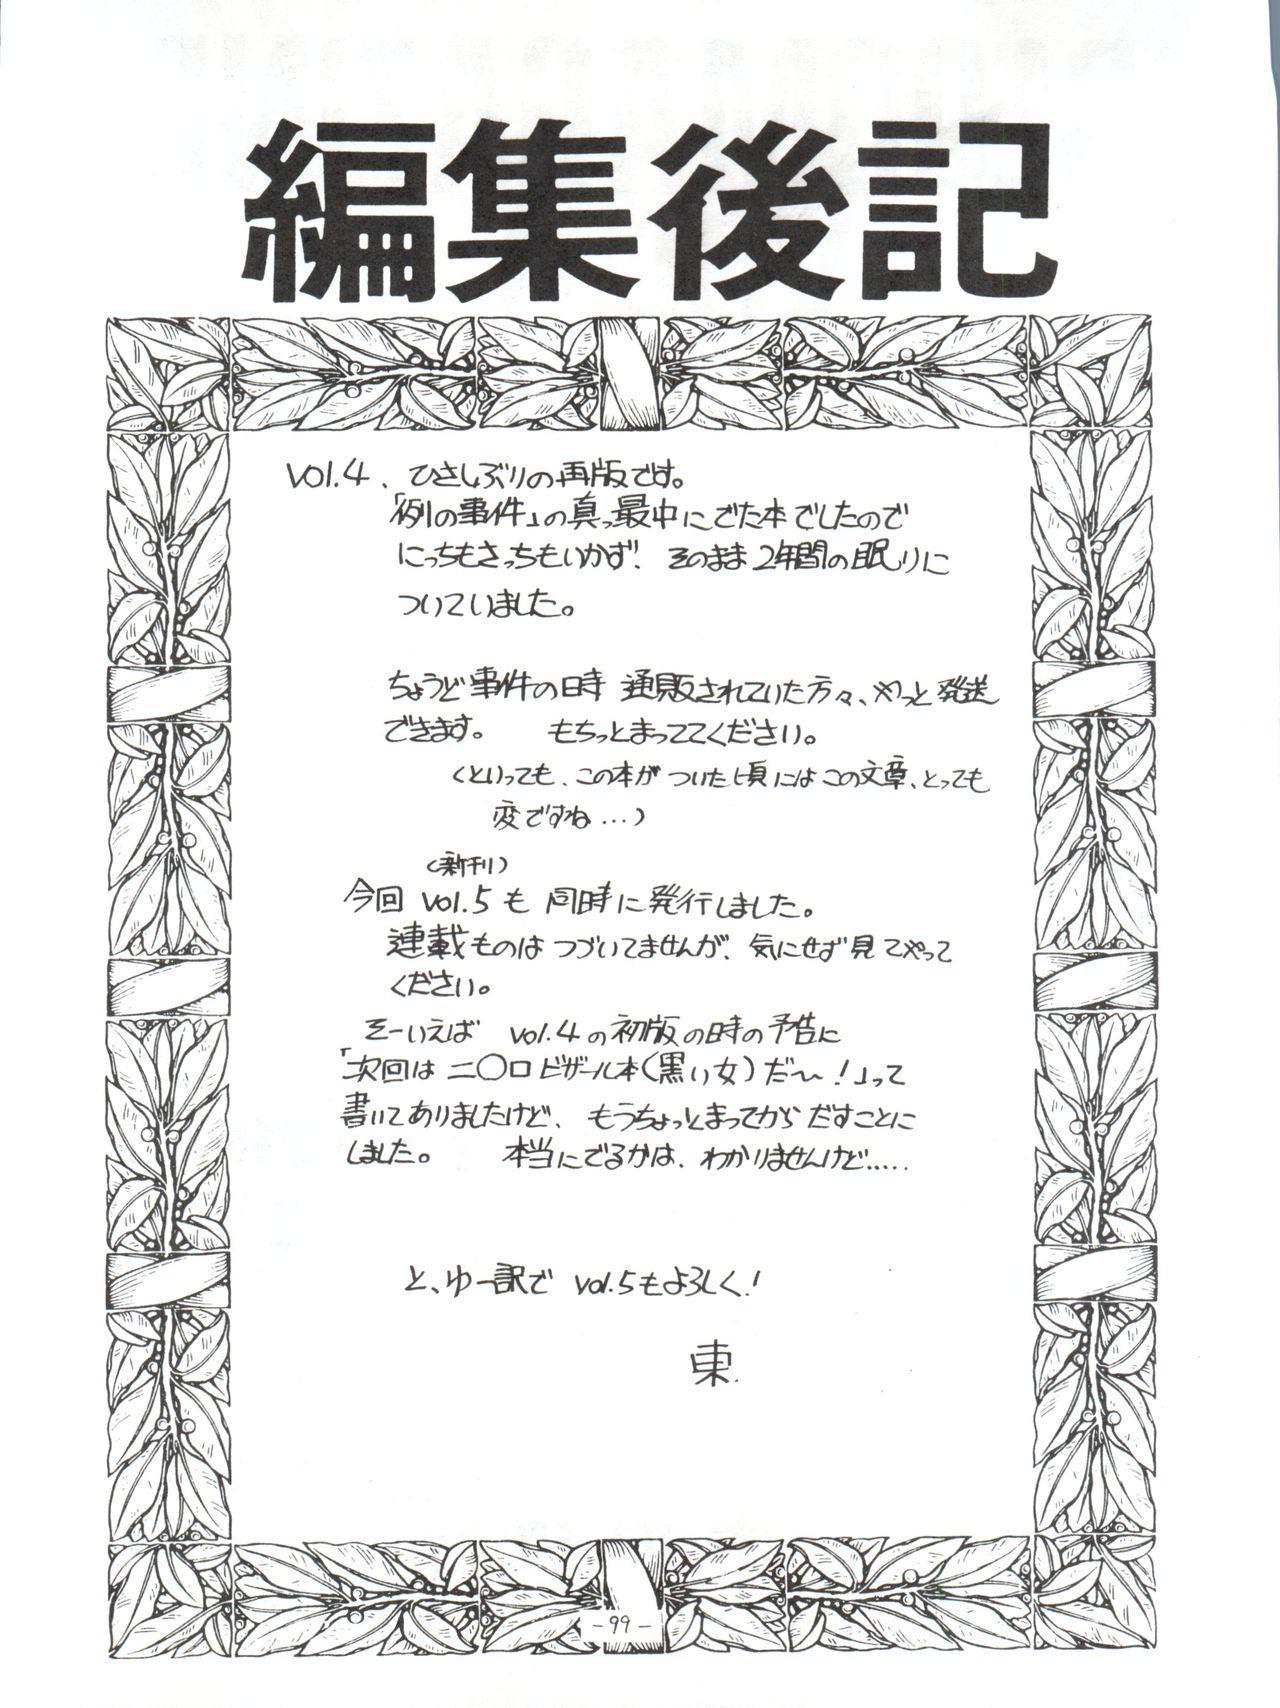 BLOOMAGAZINE Vol. 4 98